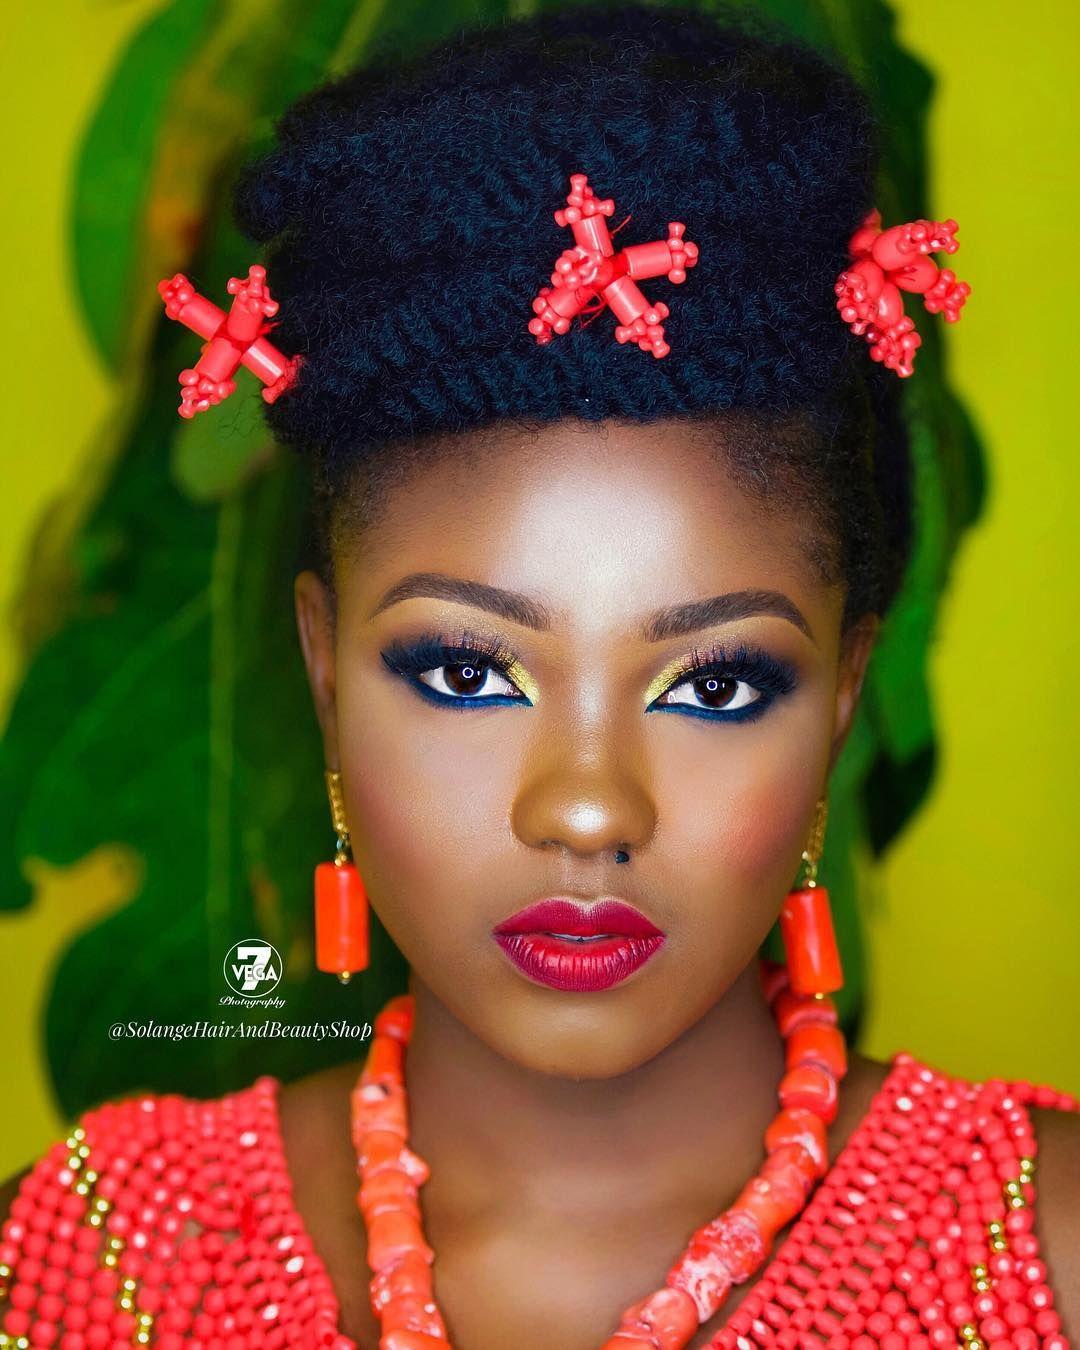 Wedding Hairstyles In Nigeria: Nigeria Beauty Artist. Black